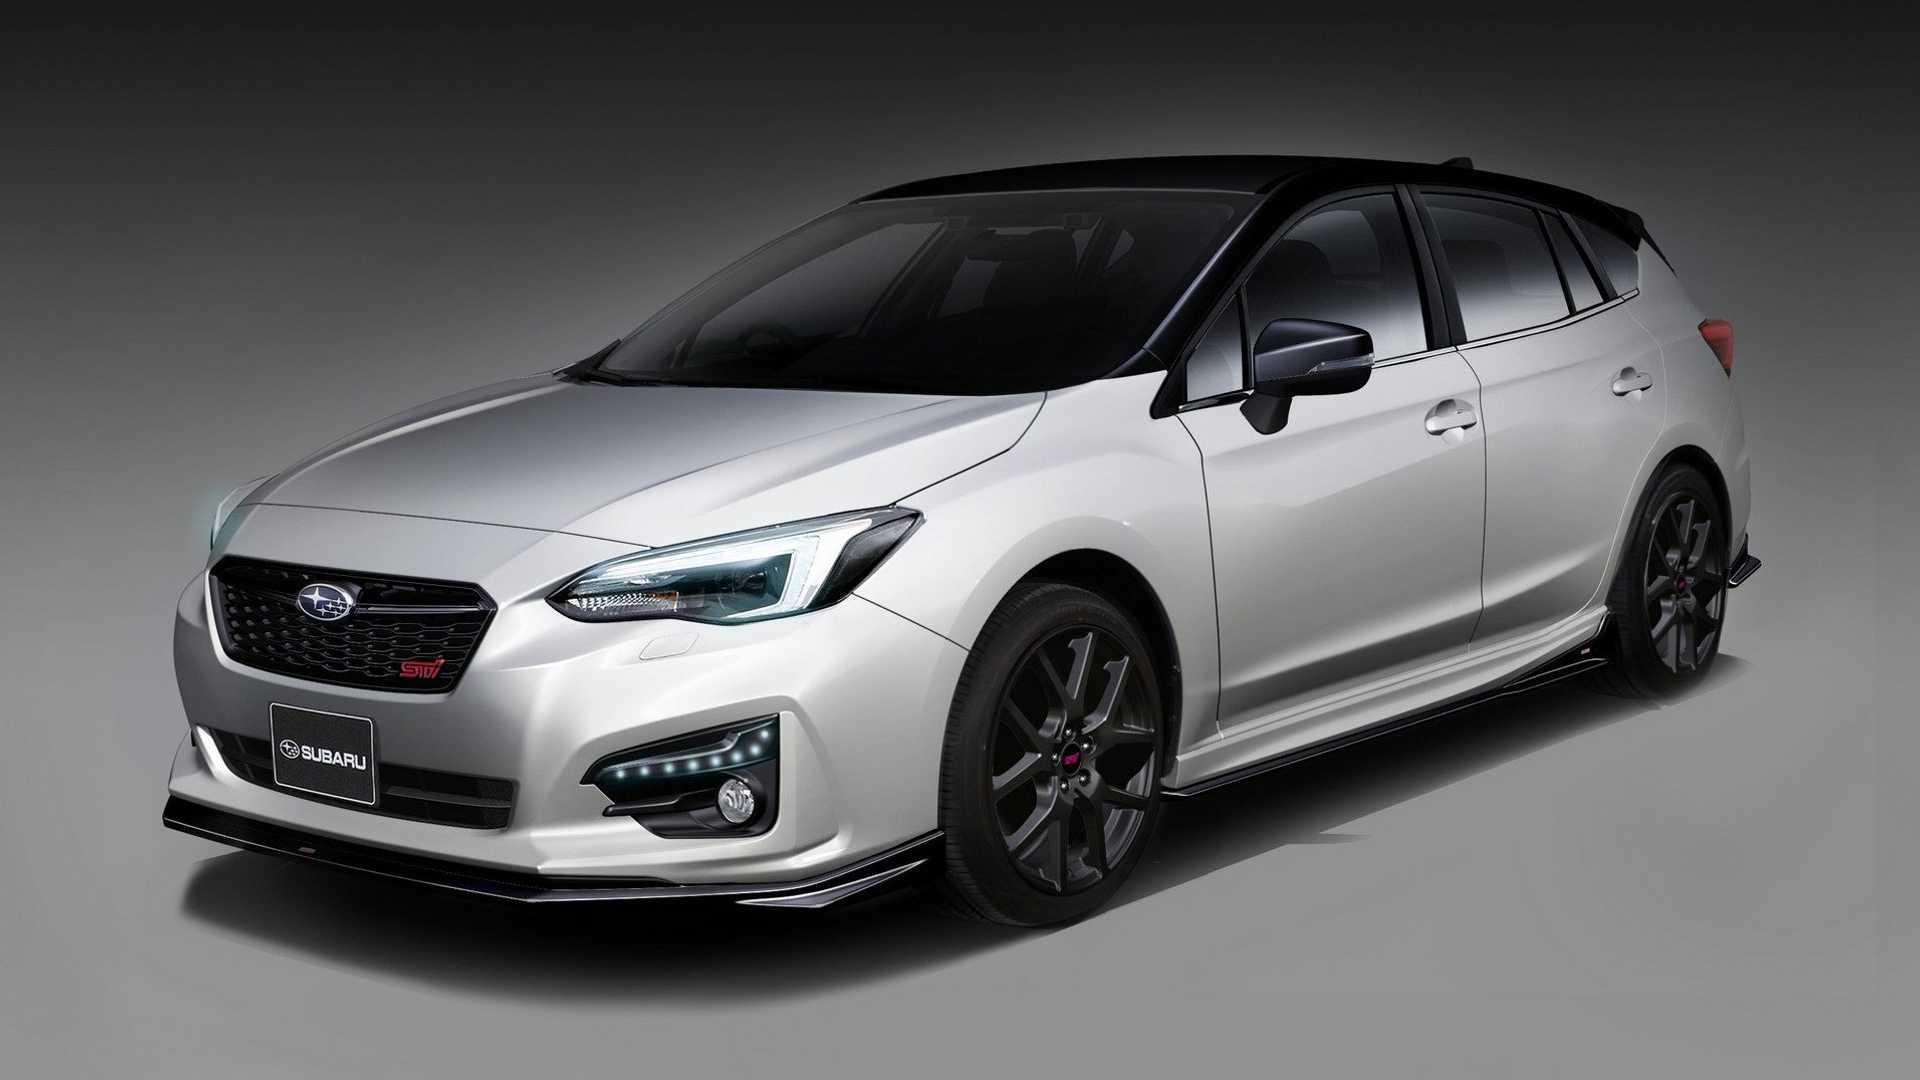 Subaru, 2019 Forester STI ve Impreza STI konseptleri